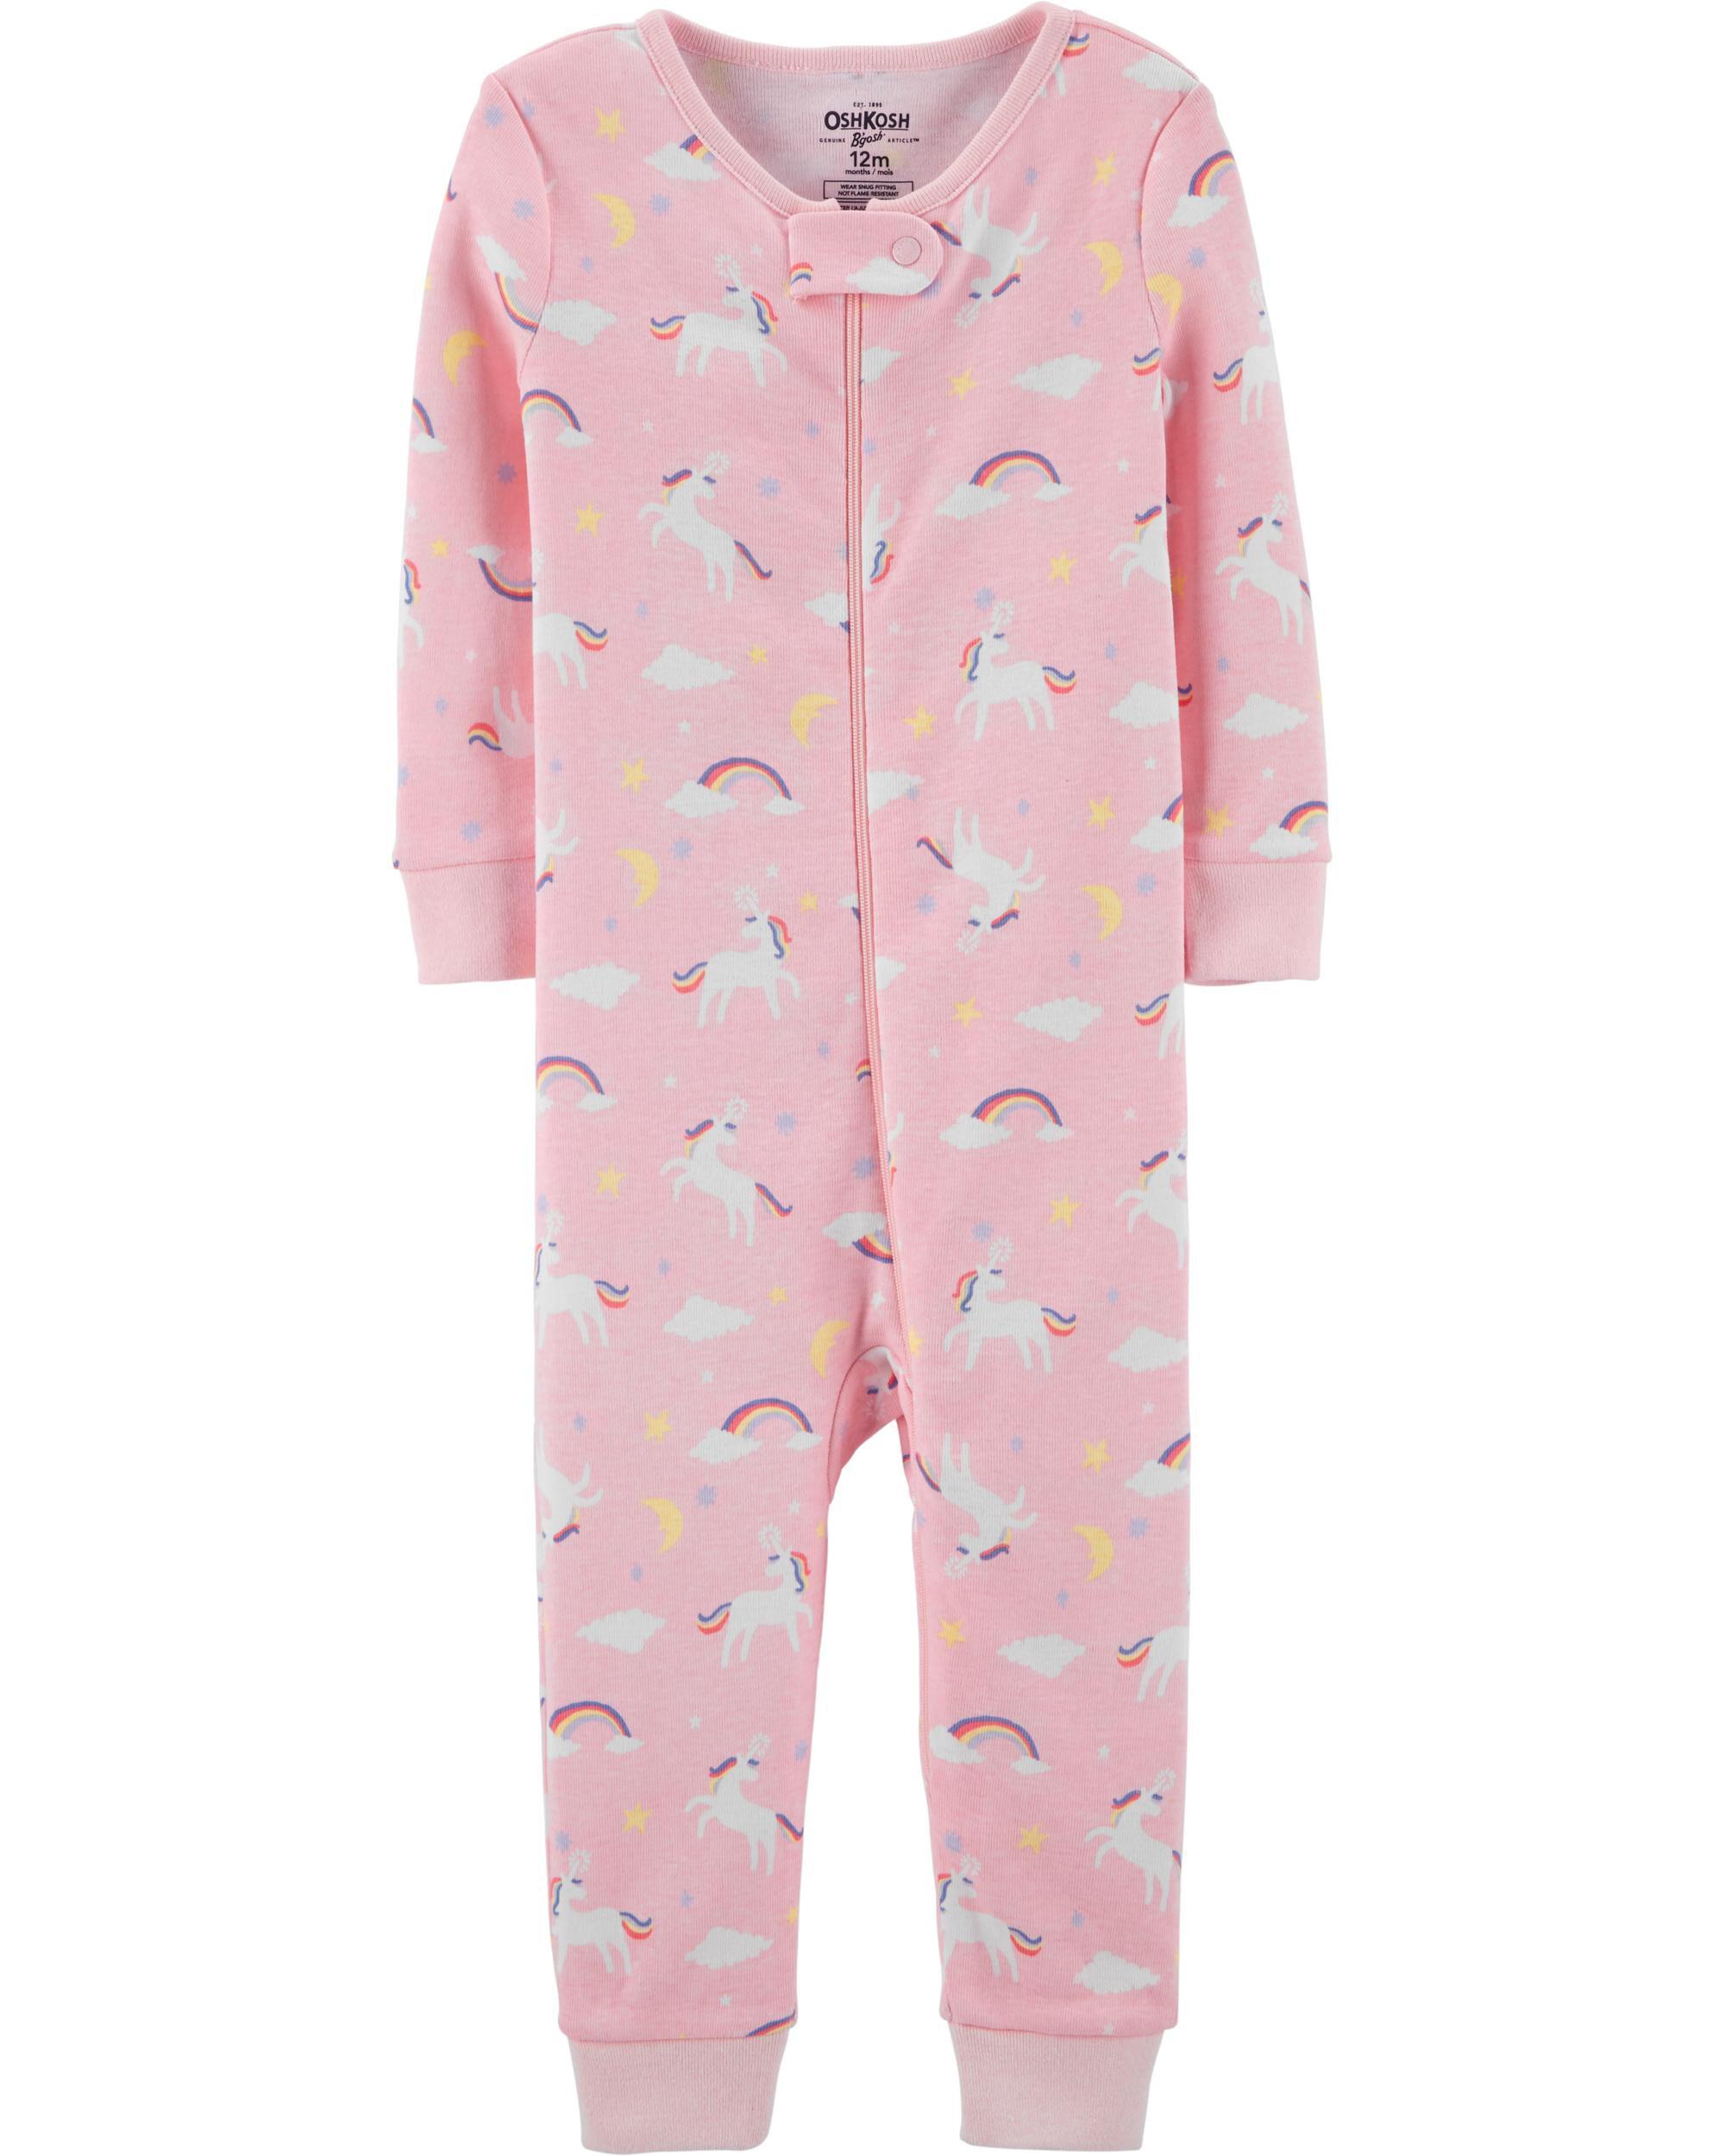 Carters Baby Girls 1-Piece Moon Snug Fit Cotton Pajamas